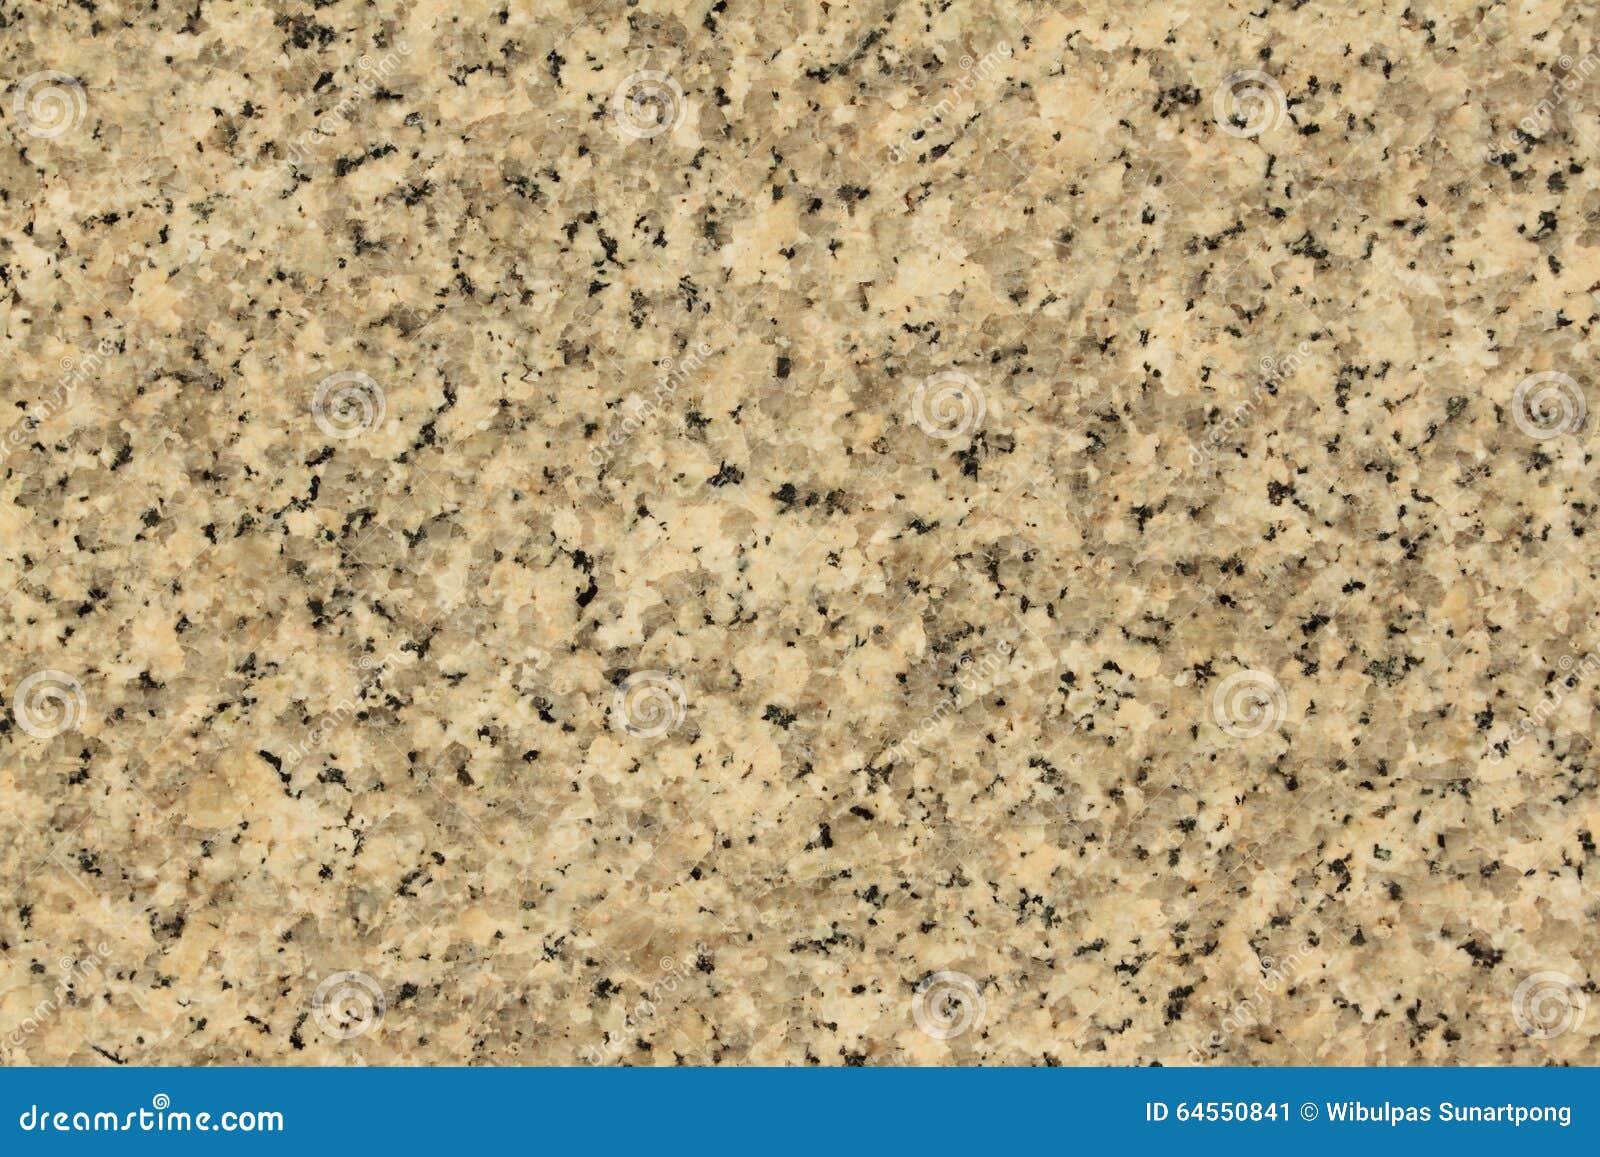 Polished Granite Stone Floor Grain Texture Close Up Stock